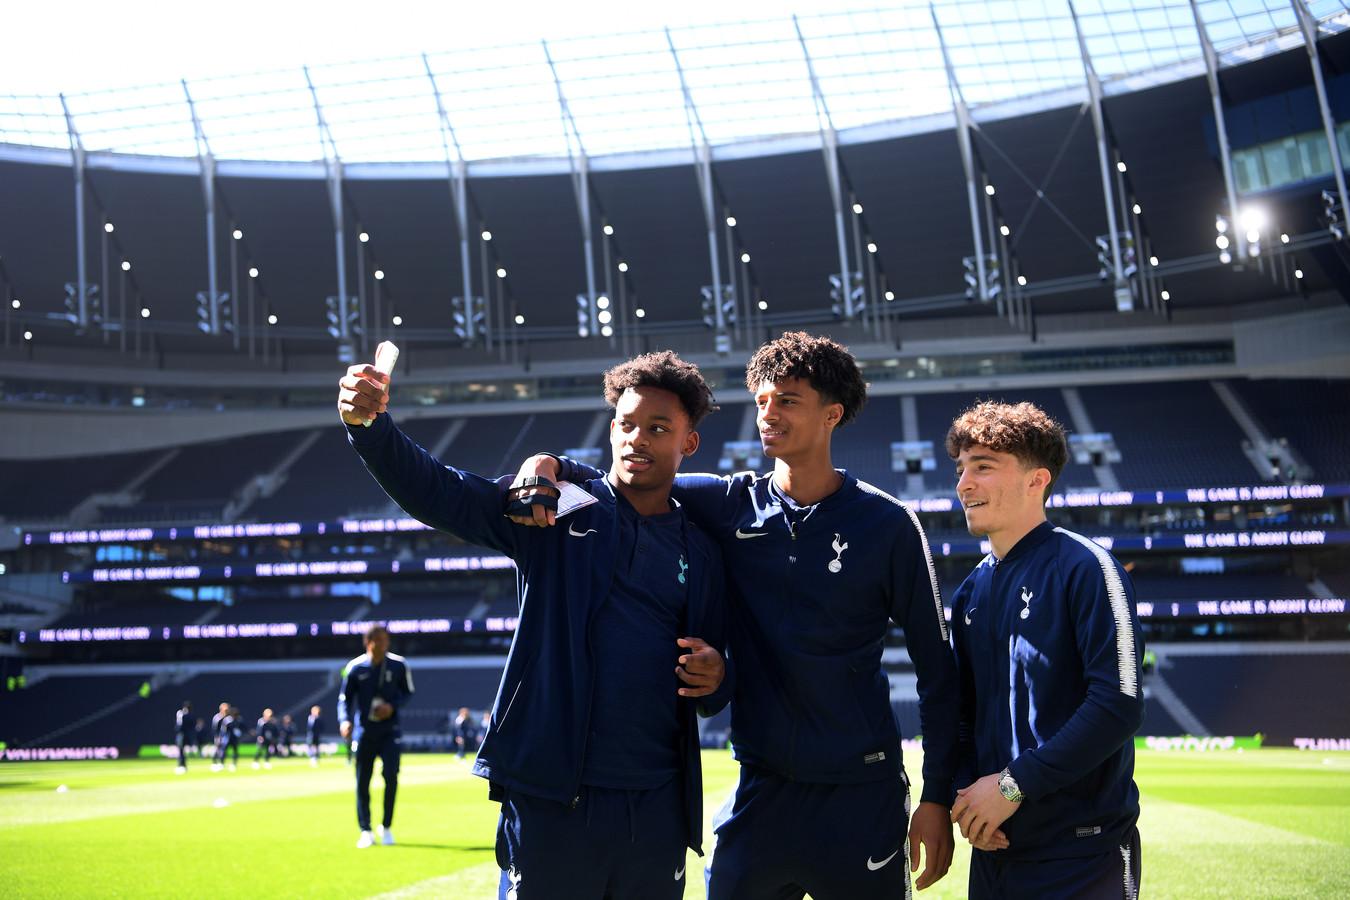 J'Neil Bennett, Brooklyn Lyons-Foster en Armando Shashoua voor de wedstrijd.